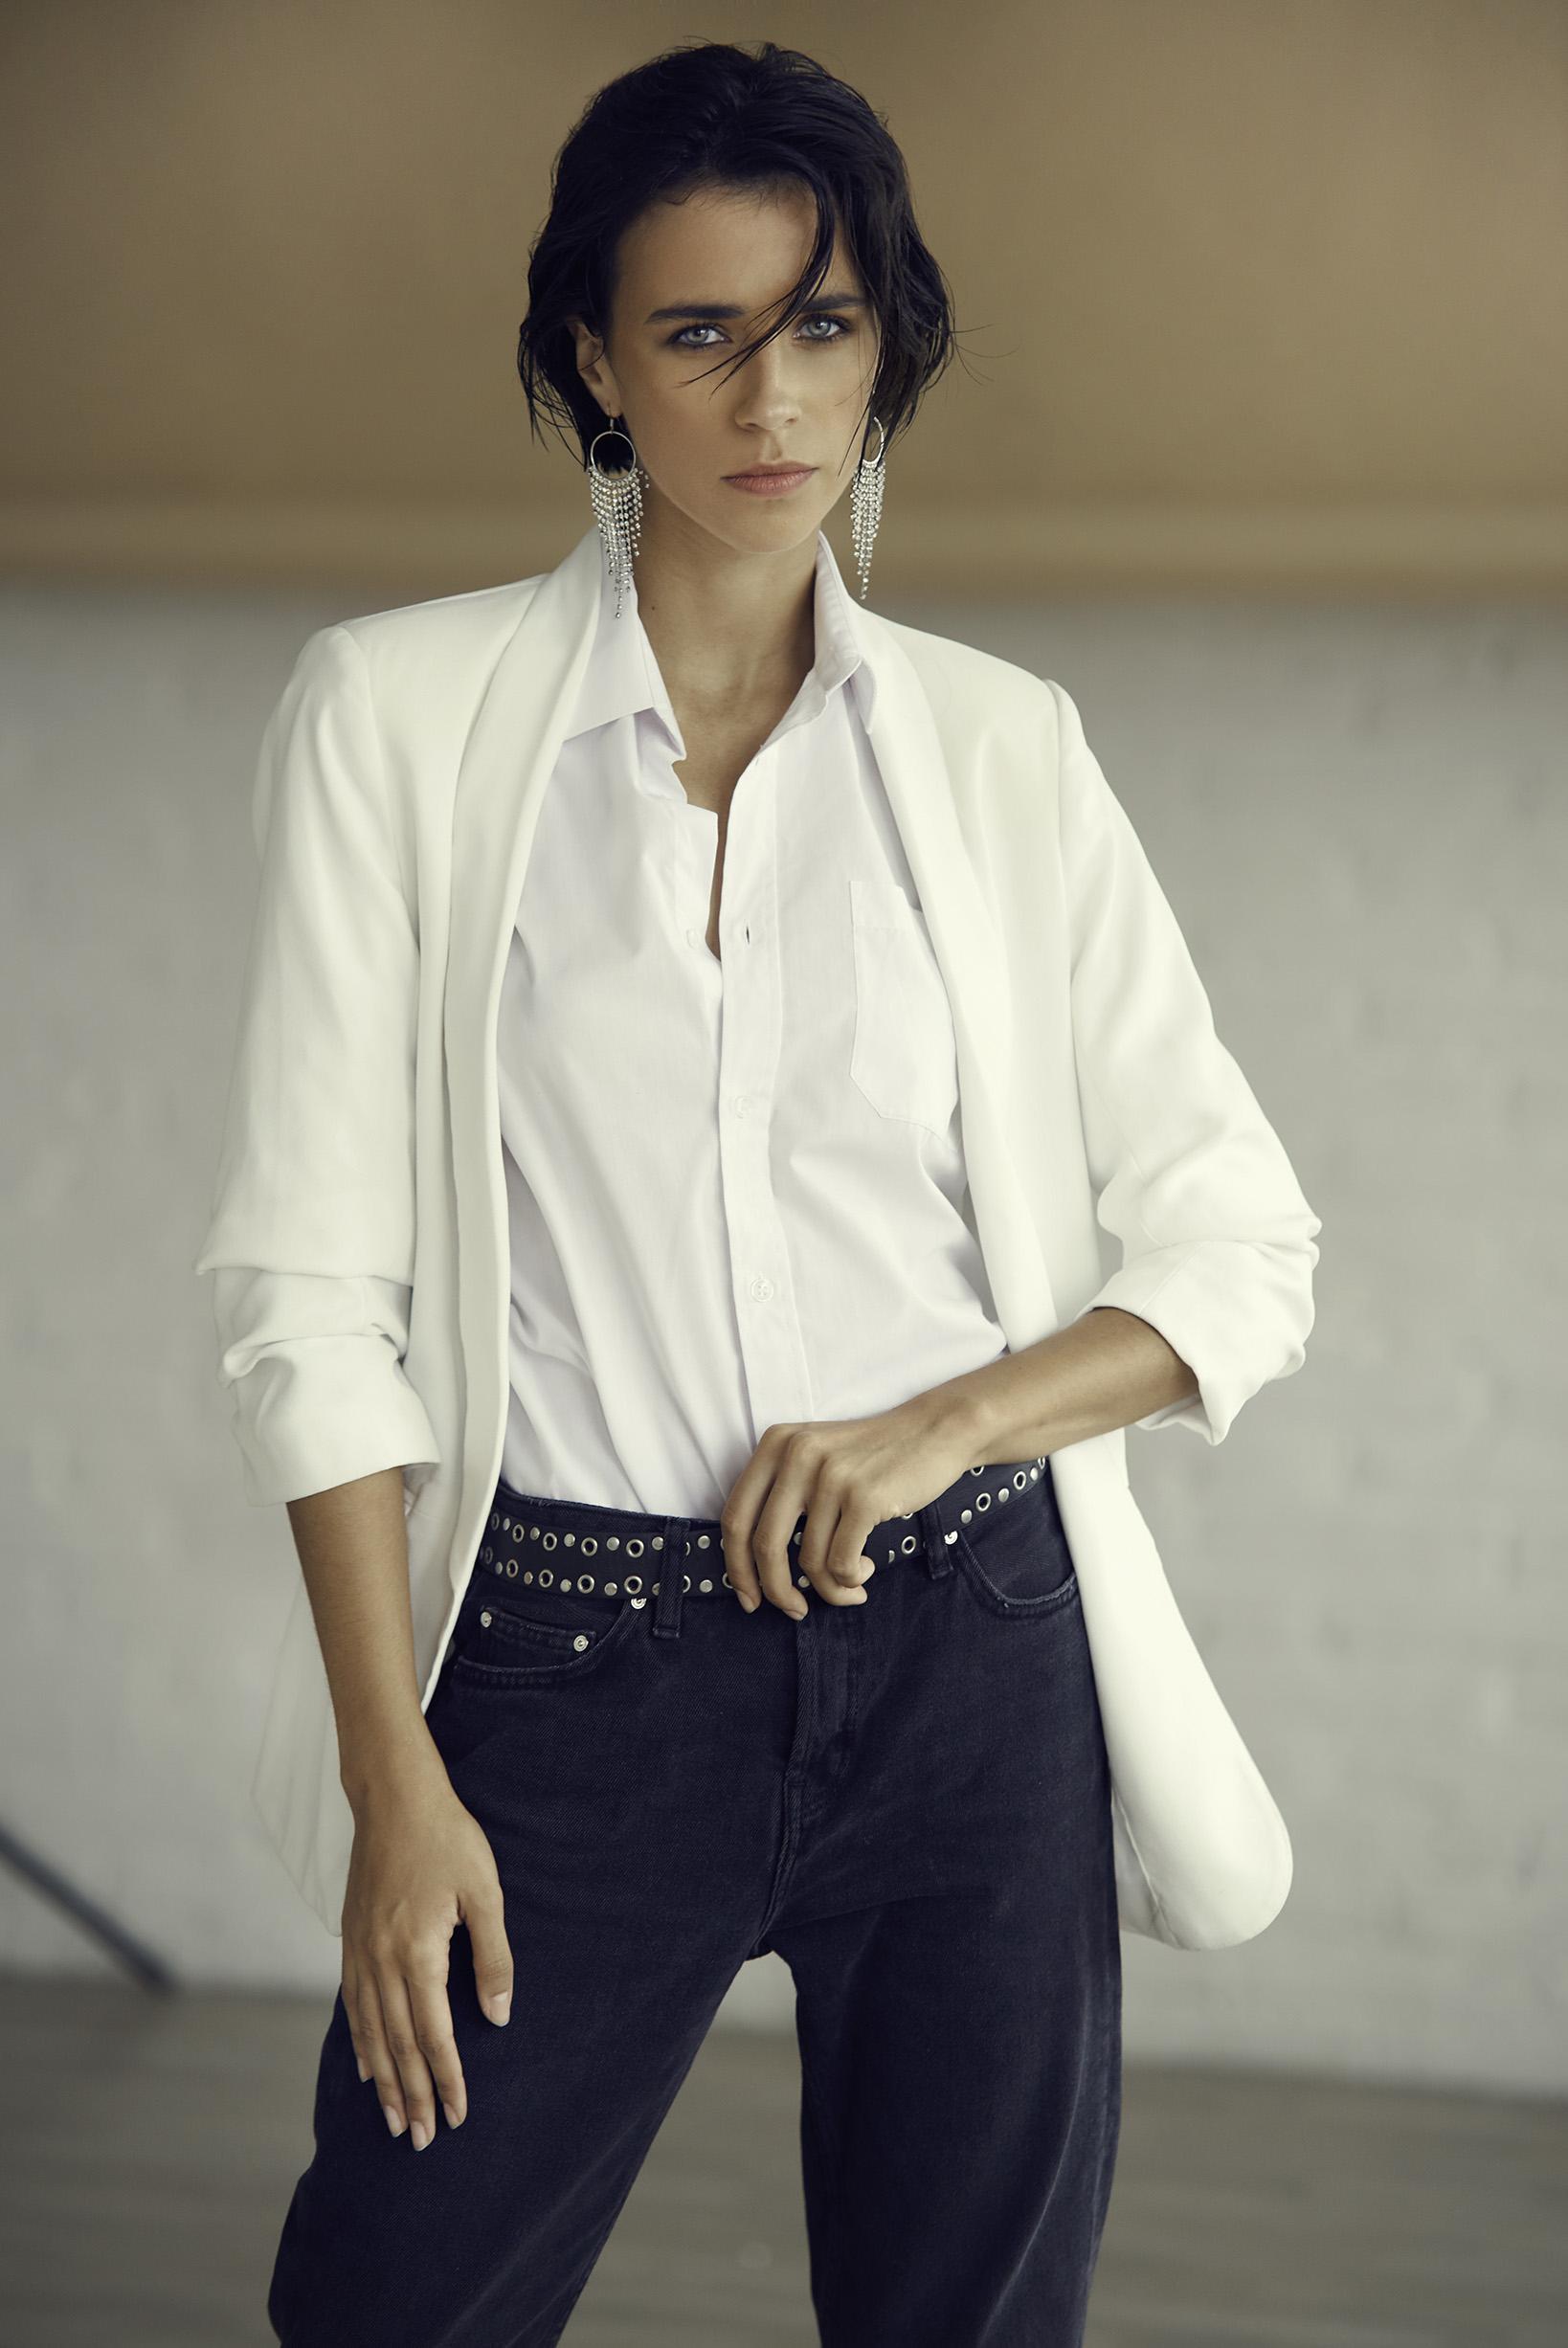 Diana Neto 31